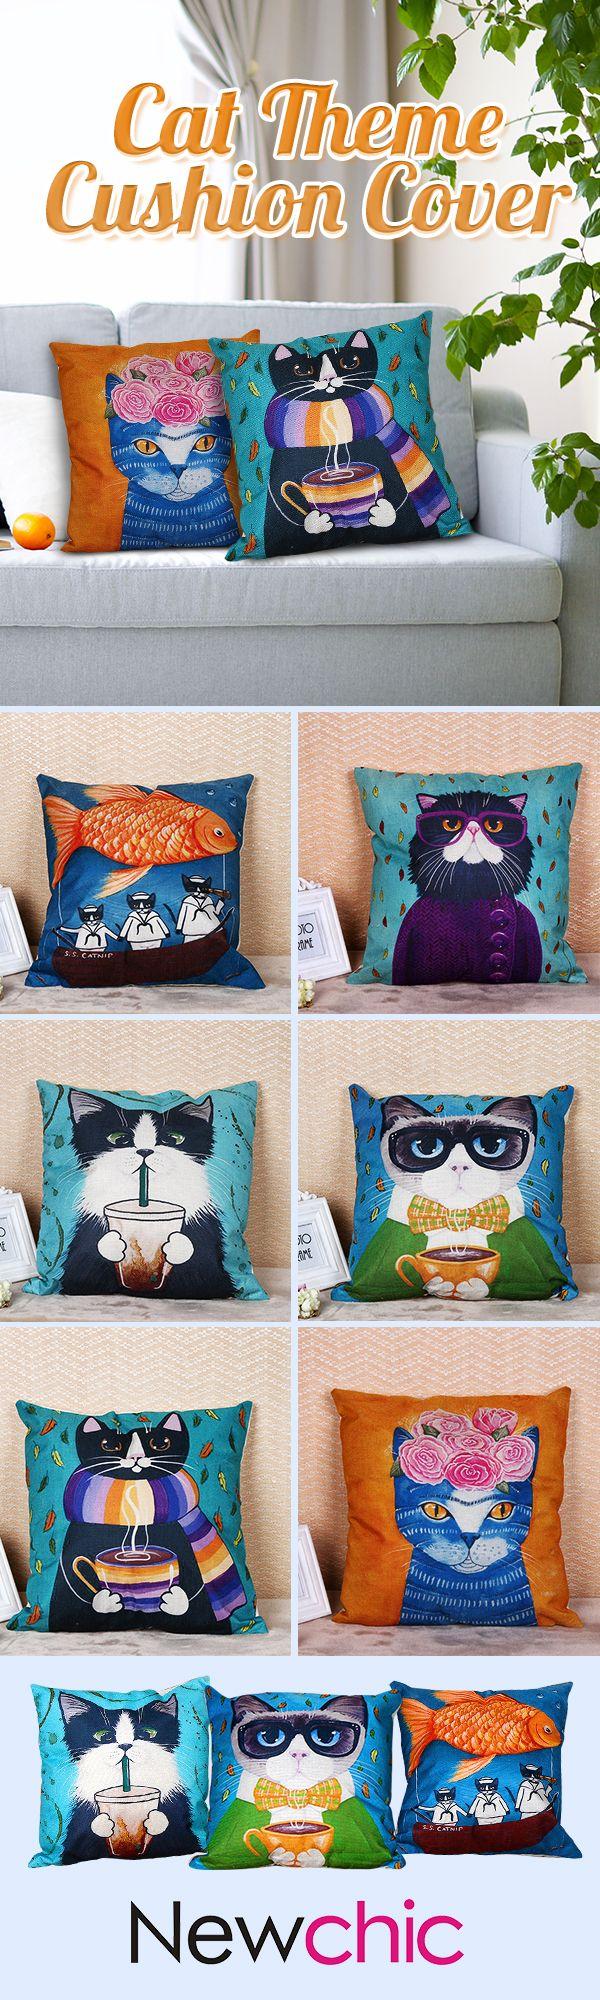 US5.13 - SOFO Cute Cartoon Cat Cushion Cover Dense Linen Square Throw Pillow Case Sofa Home Decor#newchic#homedecor#cat#pet